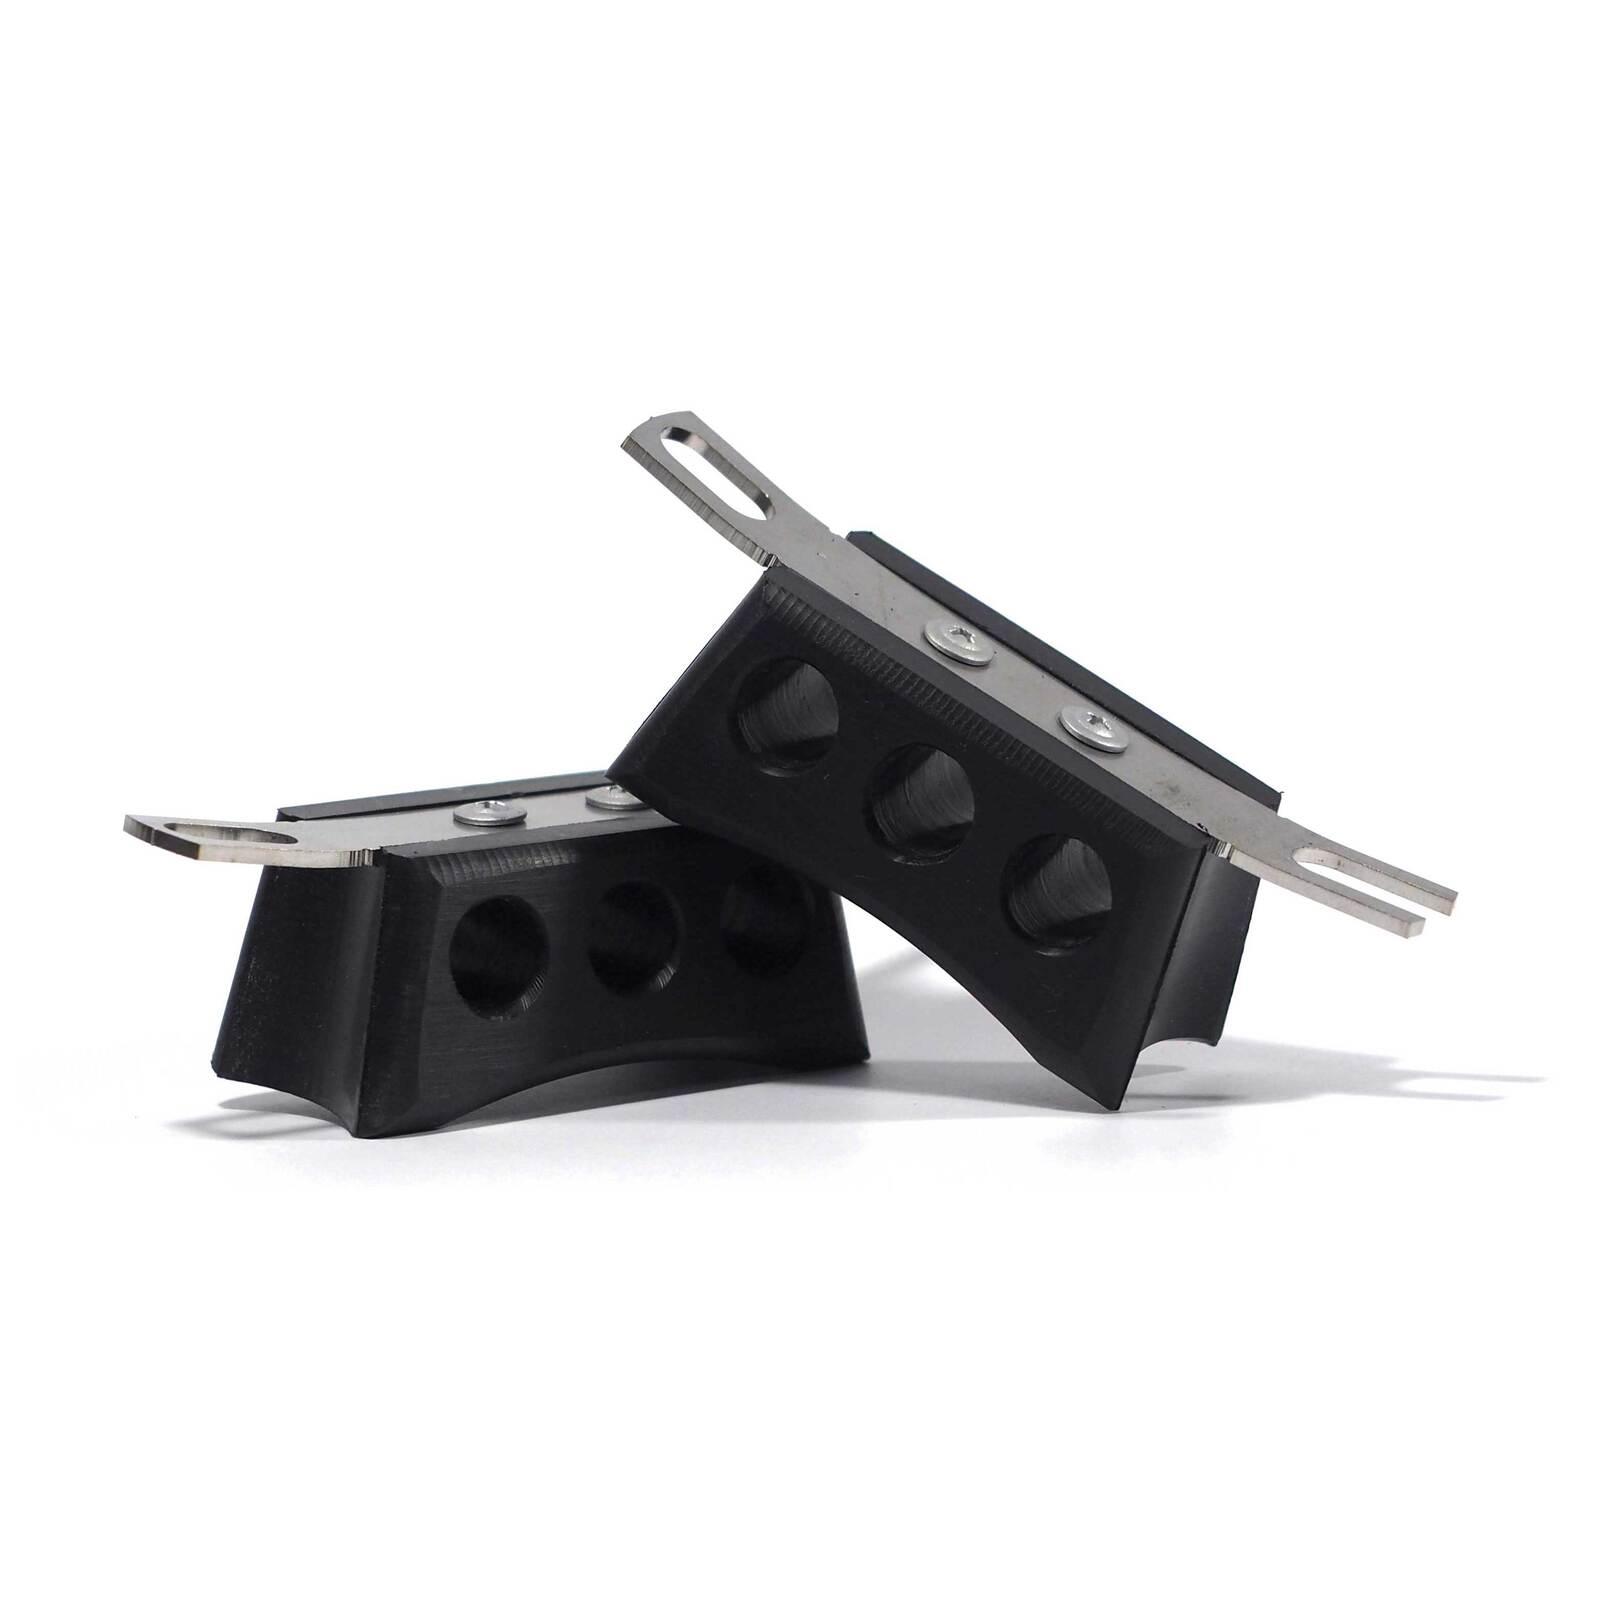 DiscoBlox Standard, LowRider, OutLaw, Bandit, or IceBlox Grind Blocks